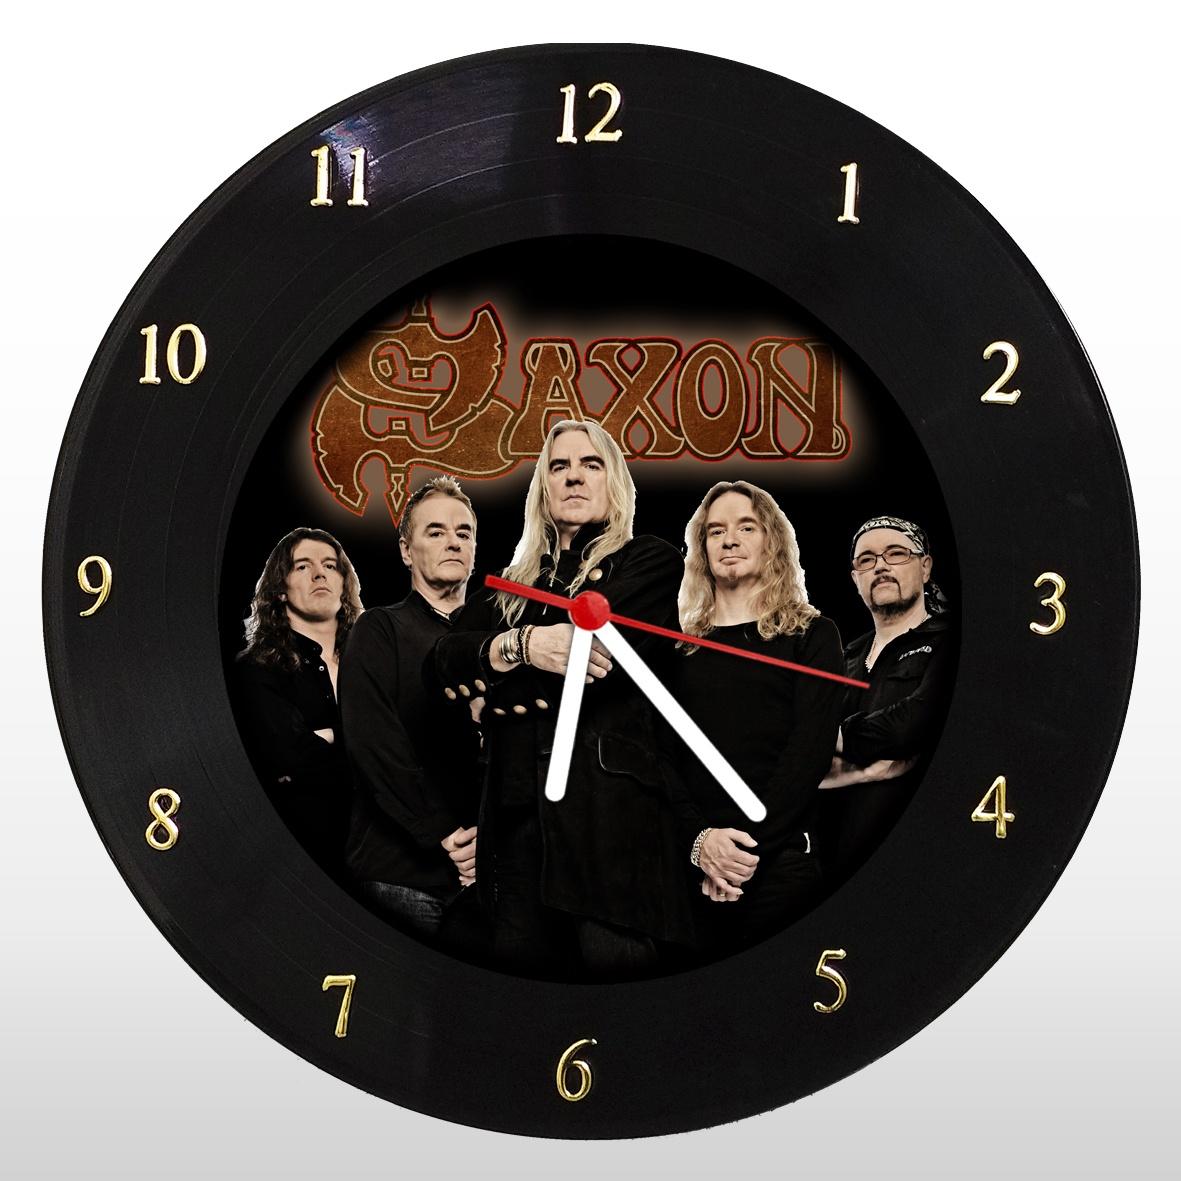 Relógio de Parede em Disco de Vinil Mr. Rock Saxon